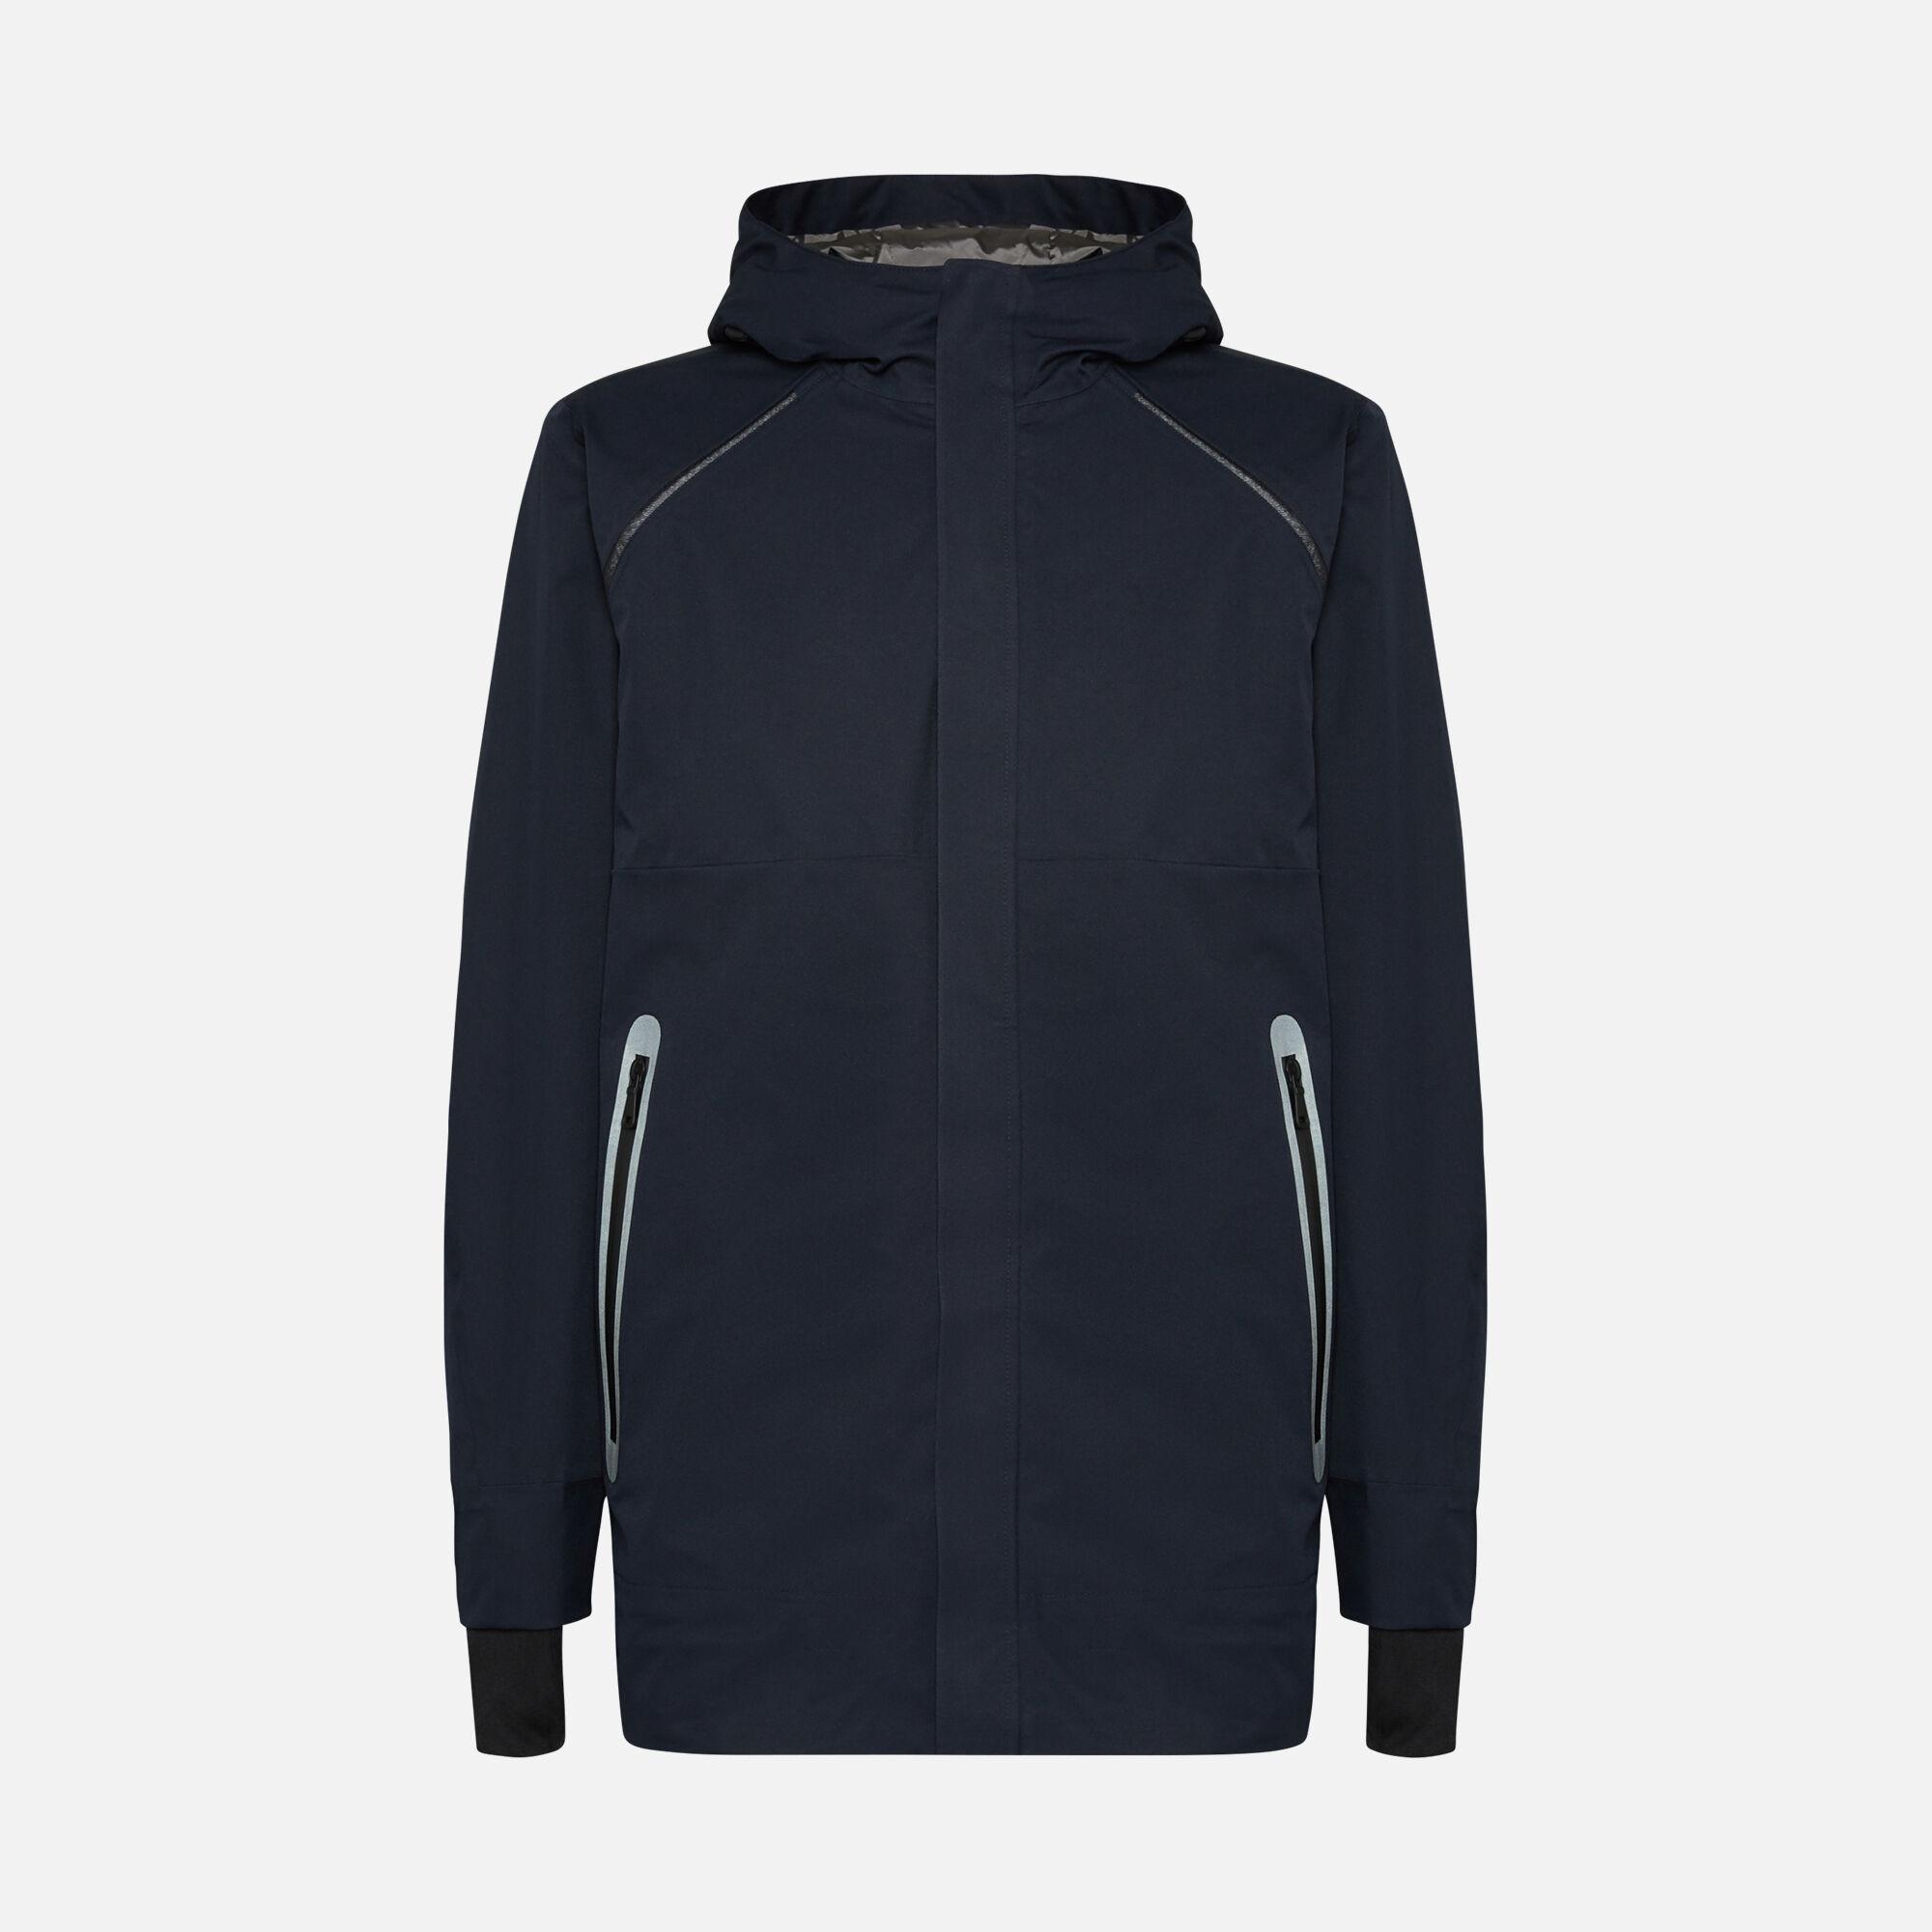 16 Best Jacket images | Jackets, Outdoor wear, Men